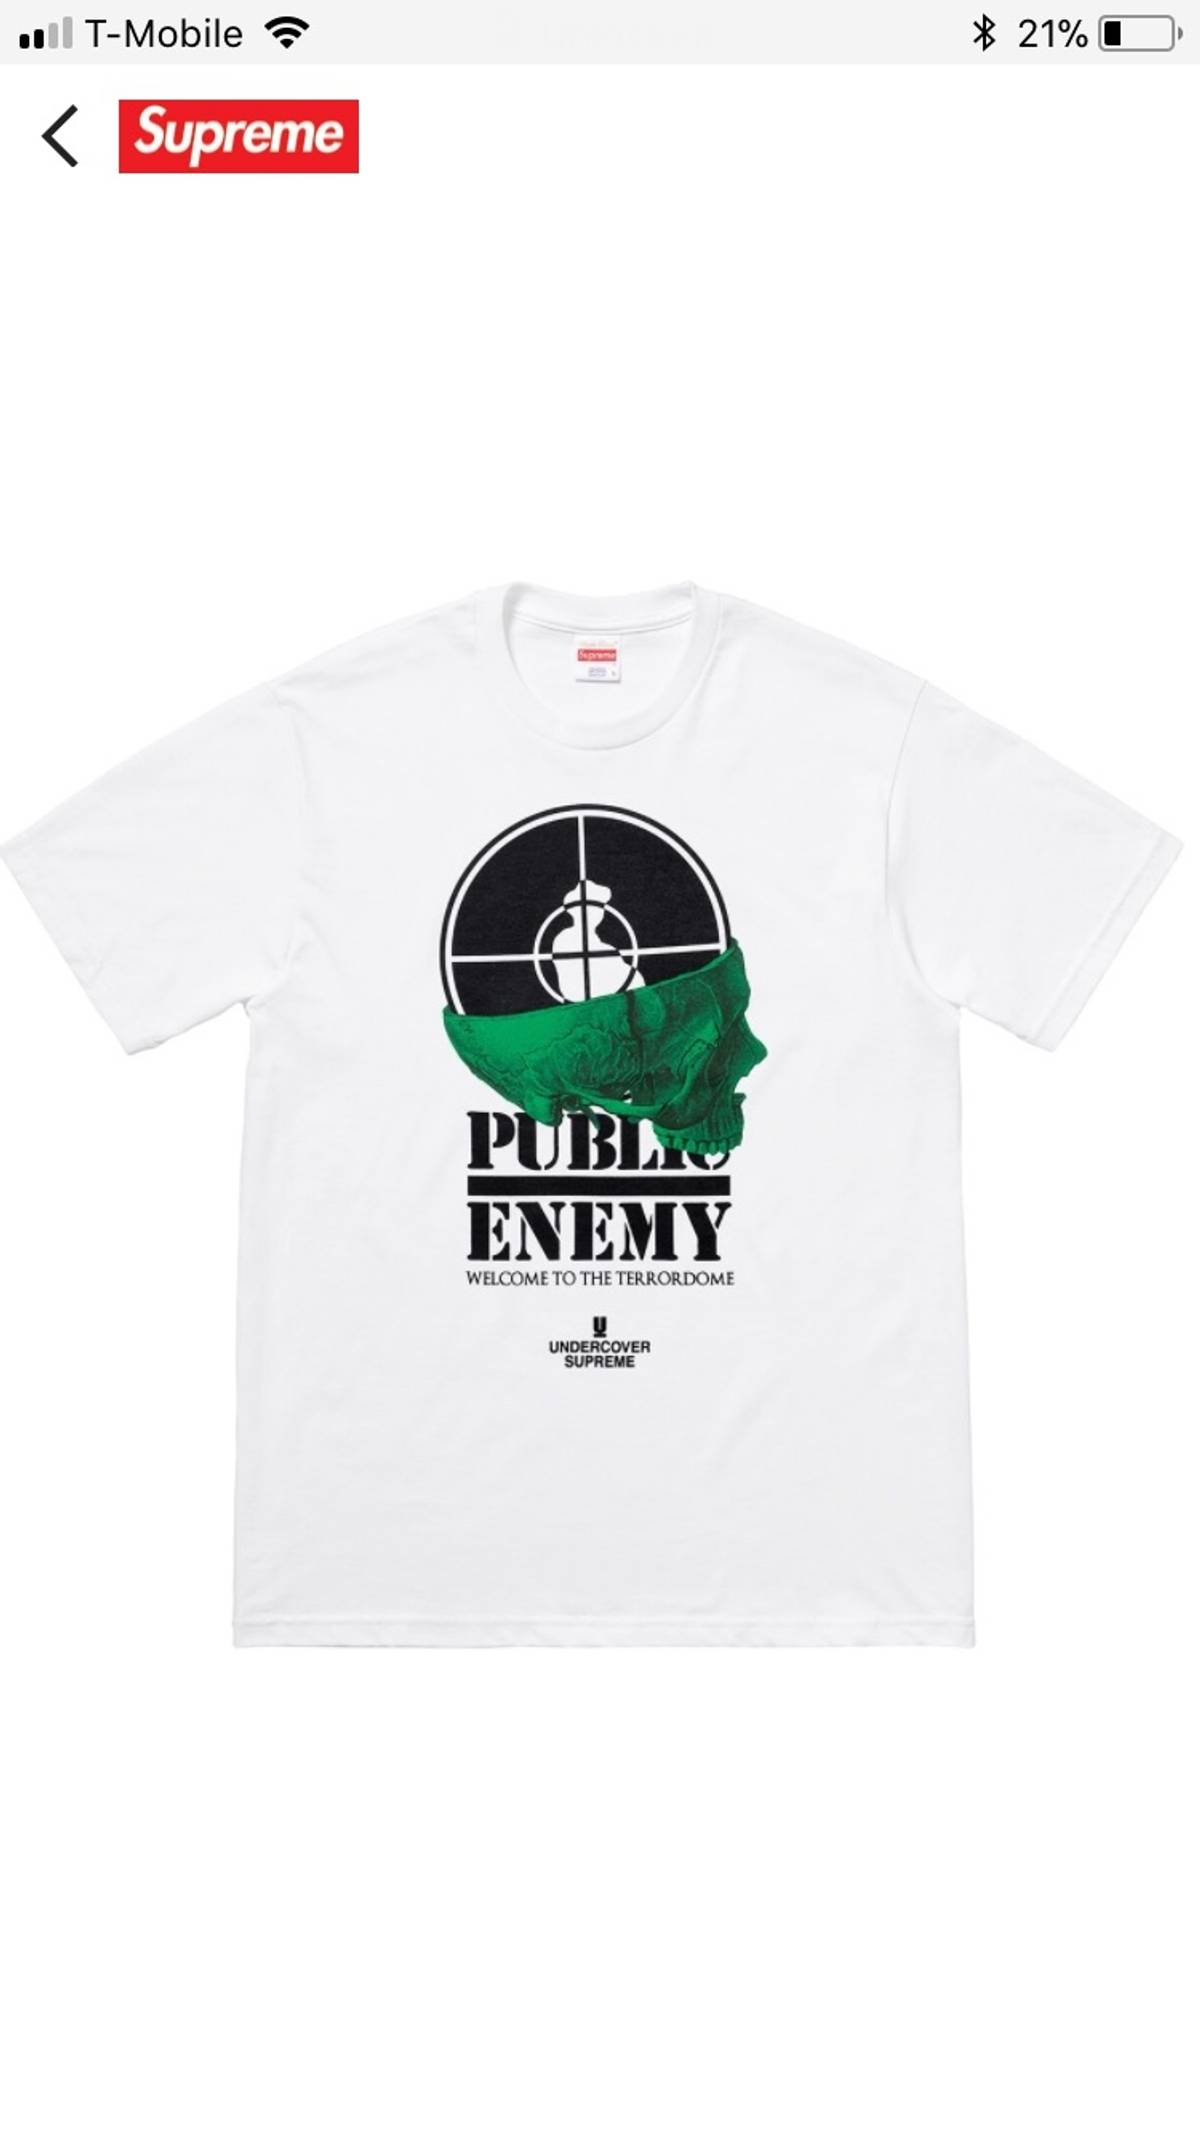 bc8b1613 Supreme Supreme X Undercover X Public Enemy Tee   Grailed